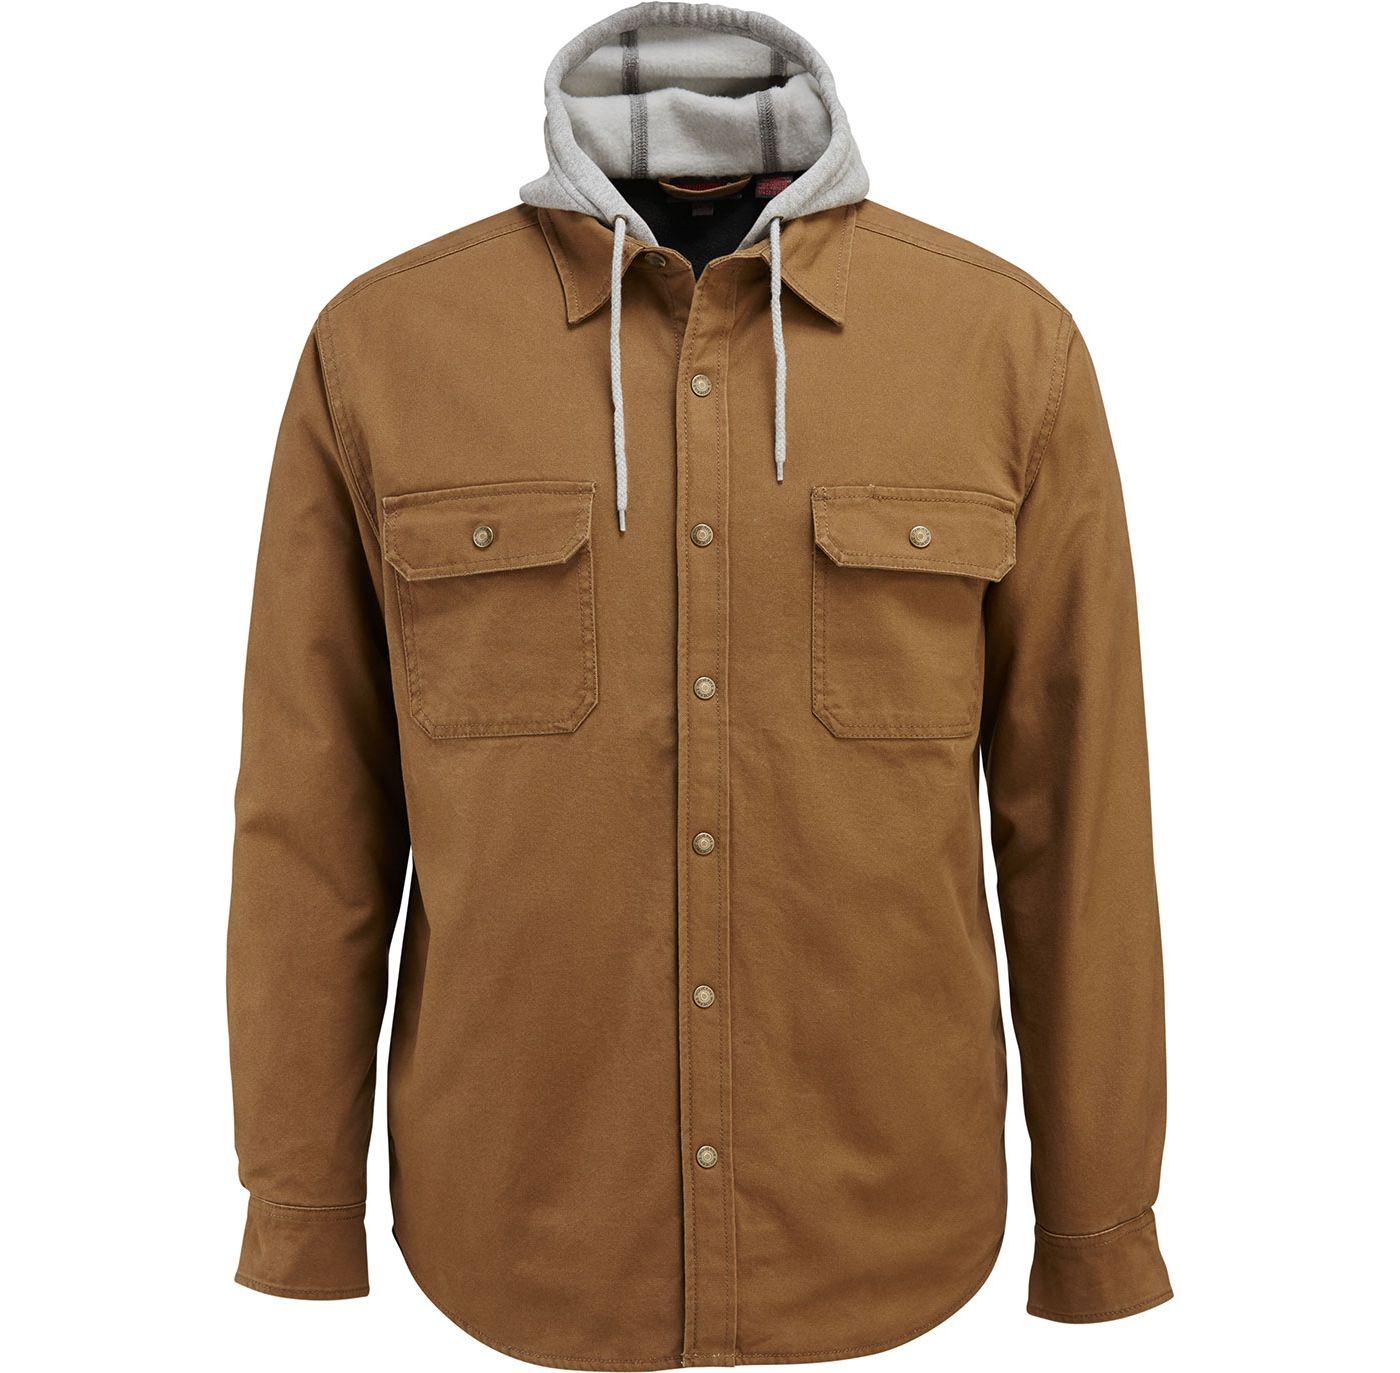 Wolverine Men's Overman Shirt Jacket (Regular and Big & Tall)